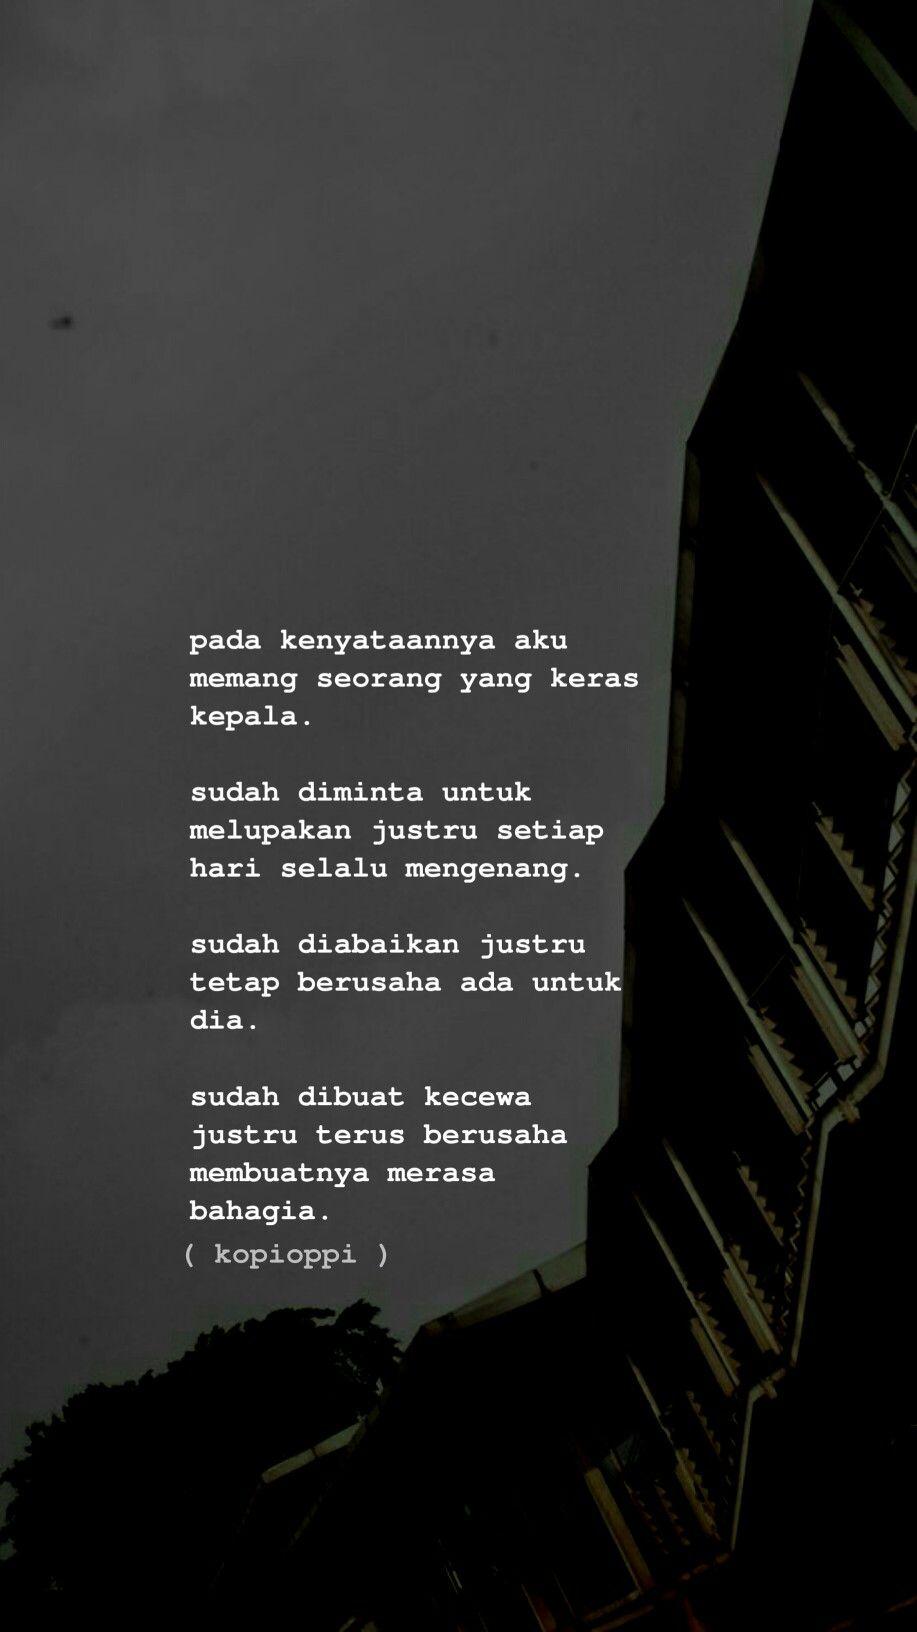 Malay Quote Kata Kata Motivasi Kutipan Tentang Cinta Kutipan Buku